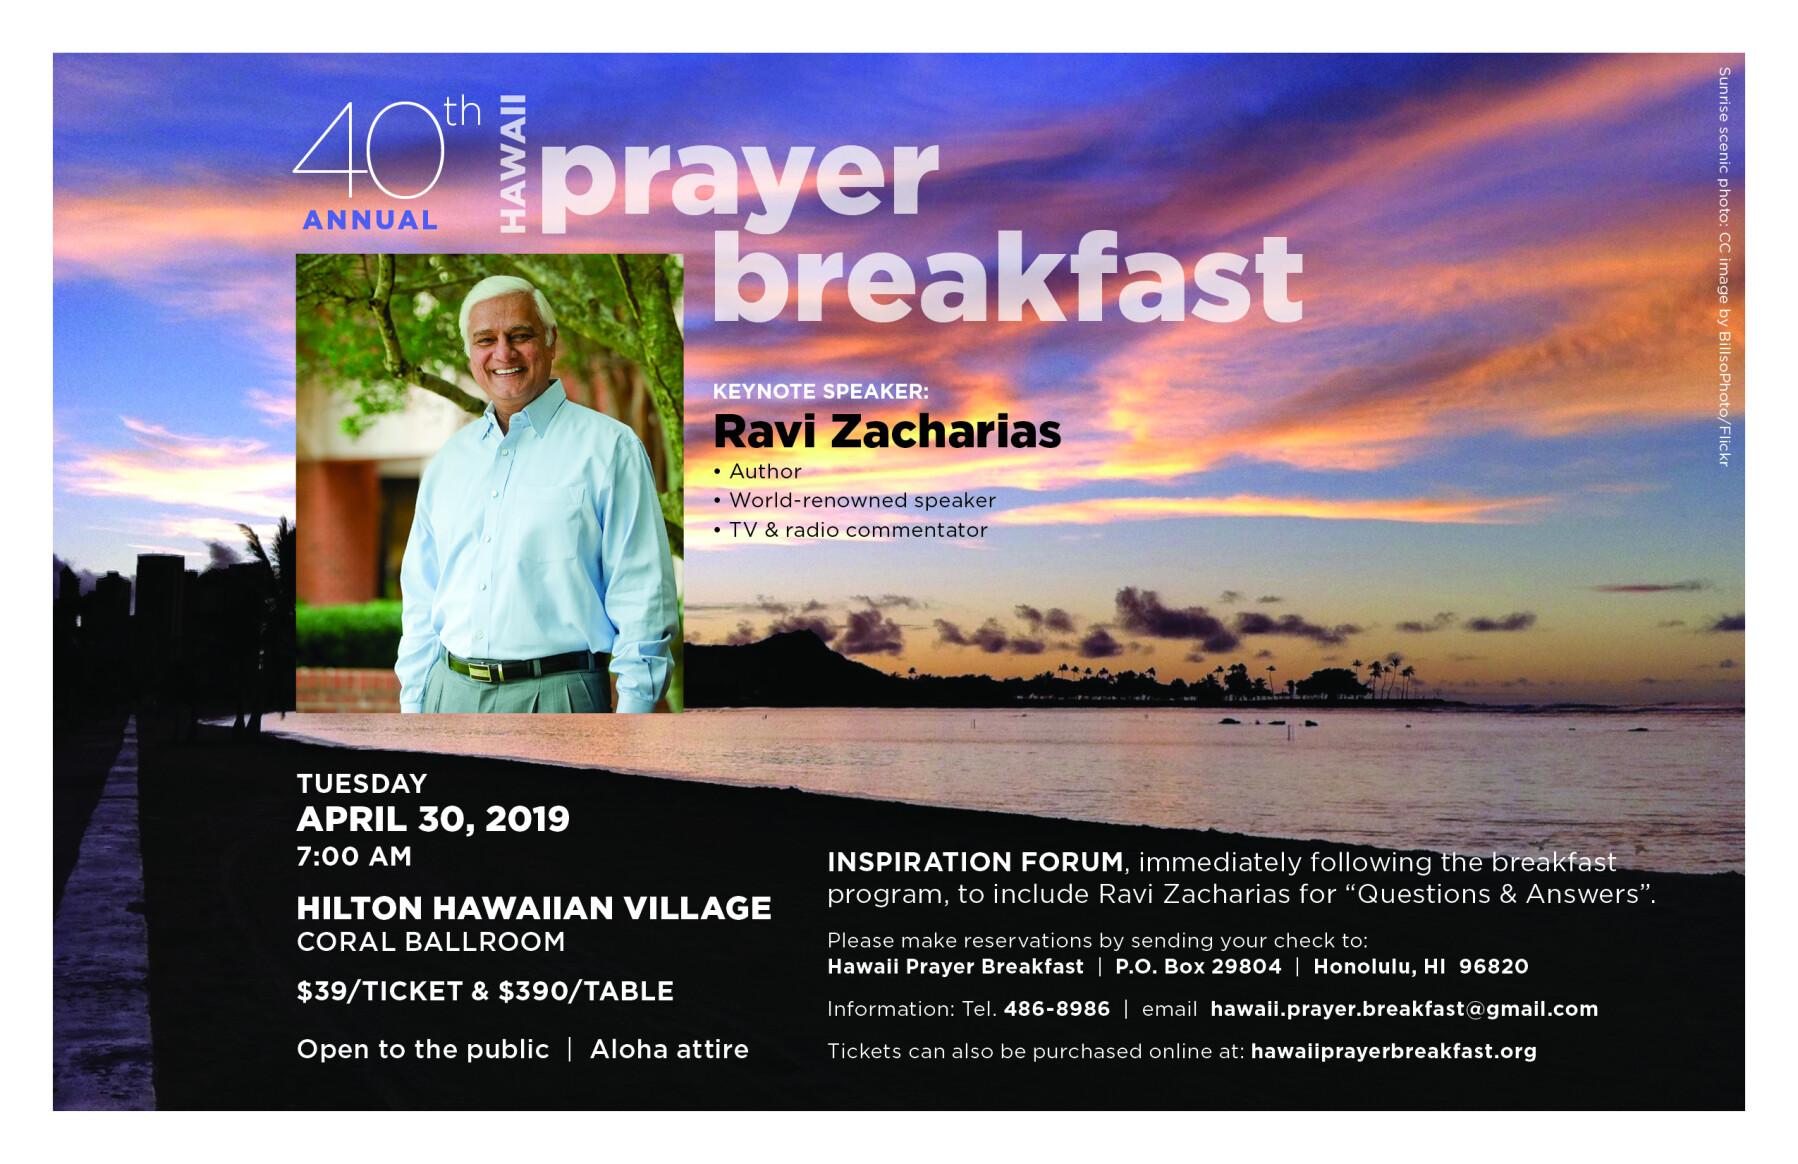 40th Annual Hawaii Prayer Breakfast